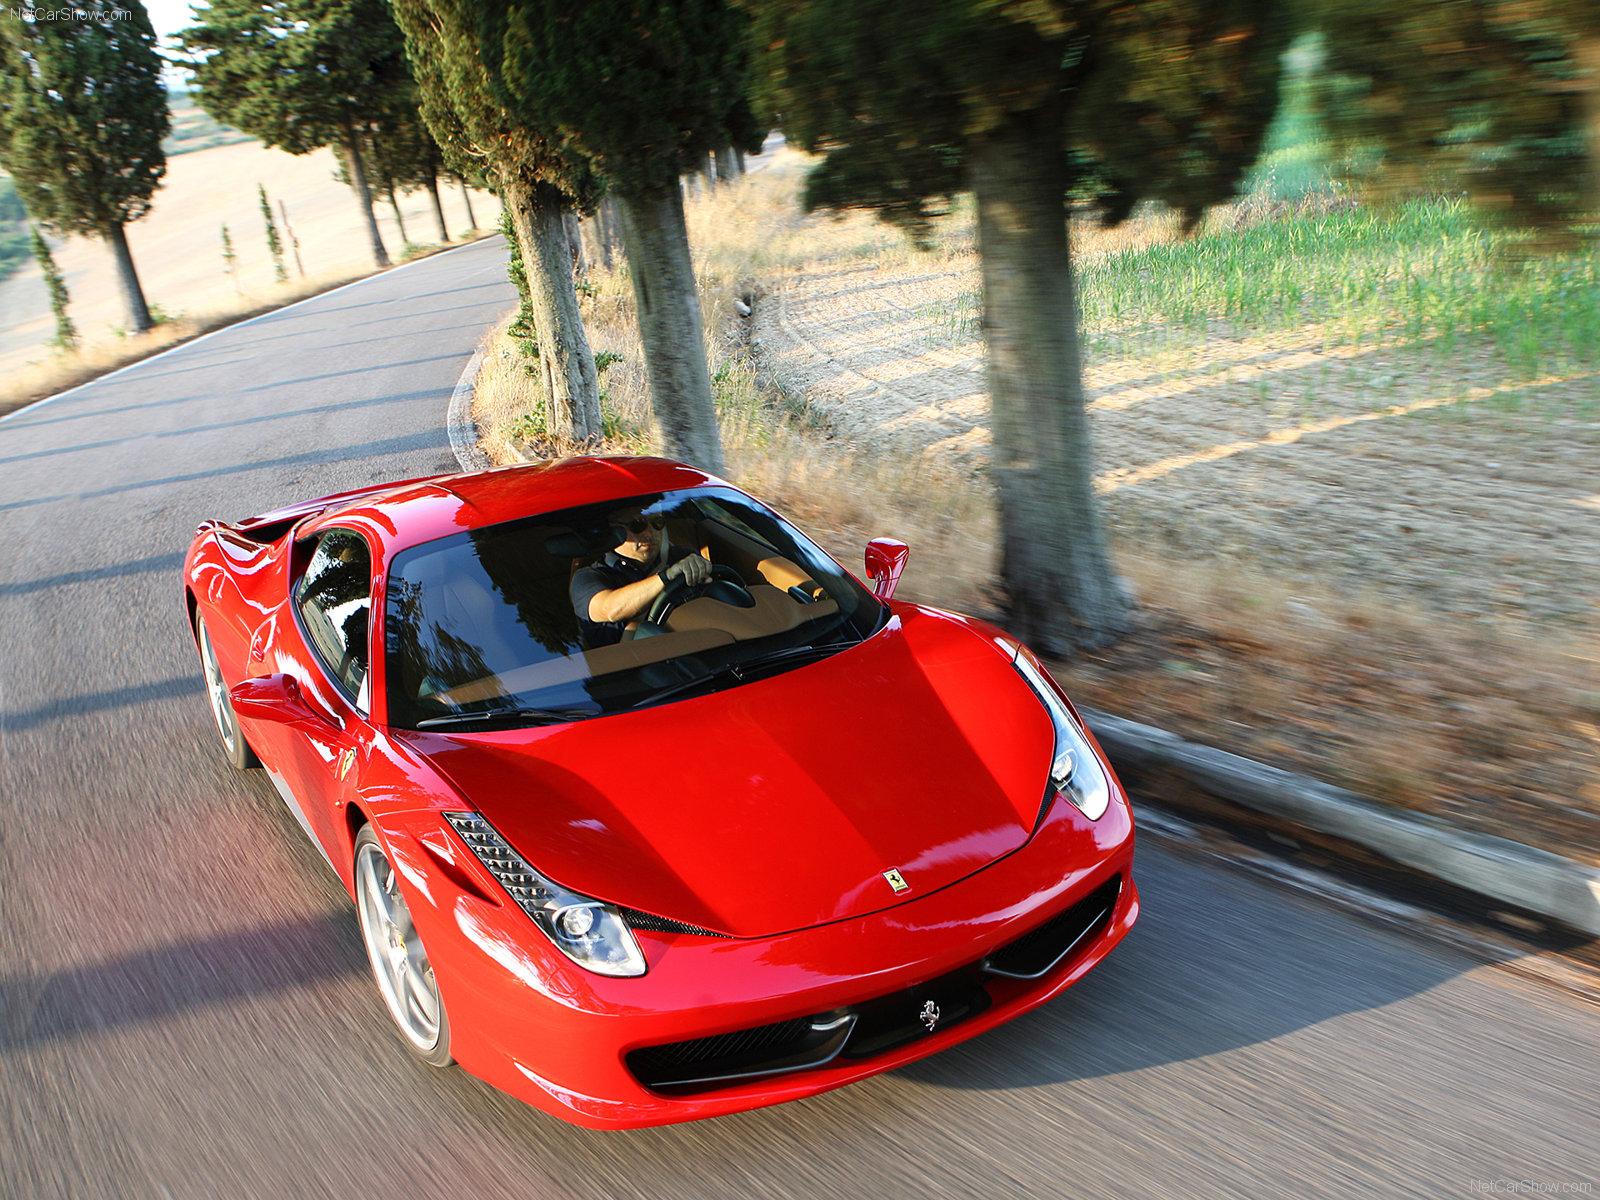 http://3.bp.blogspot.com/-dYfVk3Nc0U0/UJy2vJdhinI/AAAAAAAAGWw/o1X30EpI5n4/s1600/Ferrari-458-Italia-2011-1.jpg